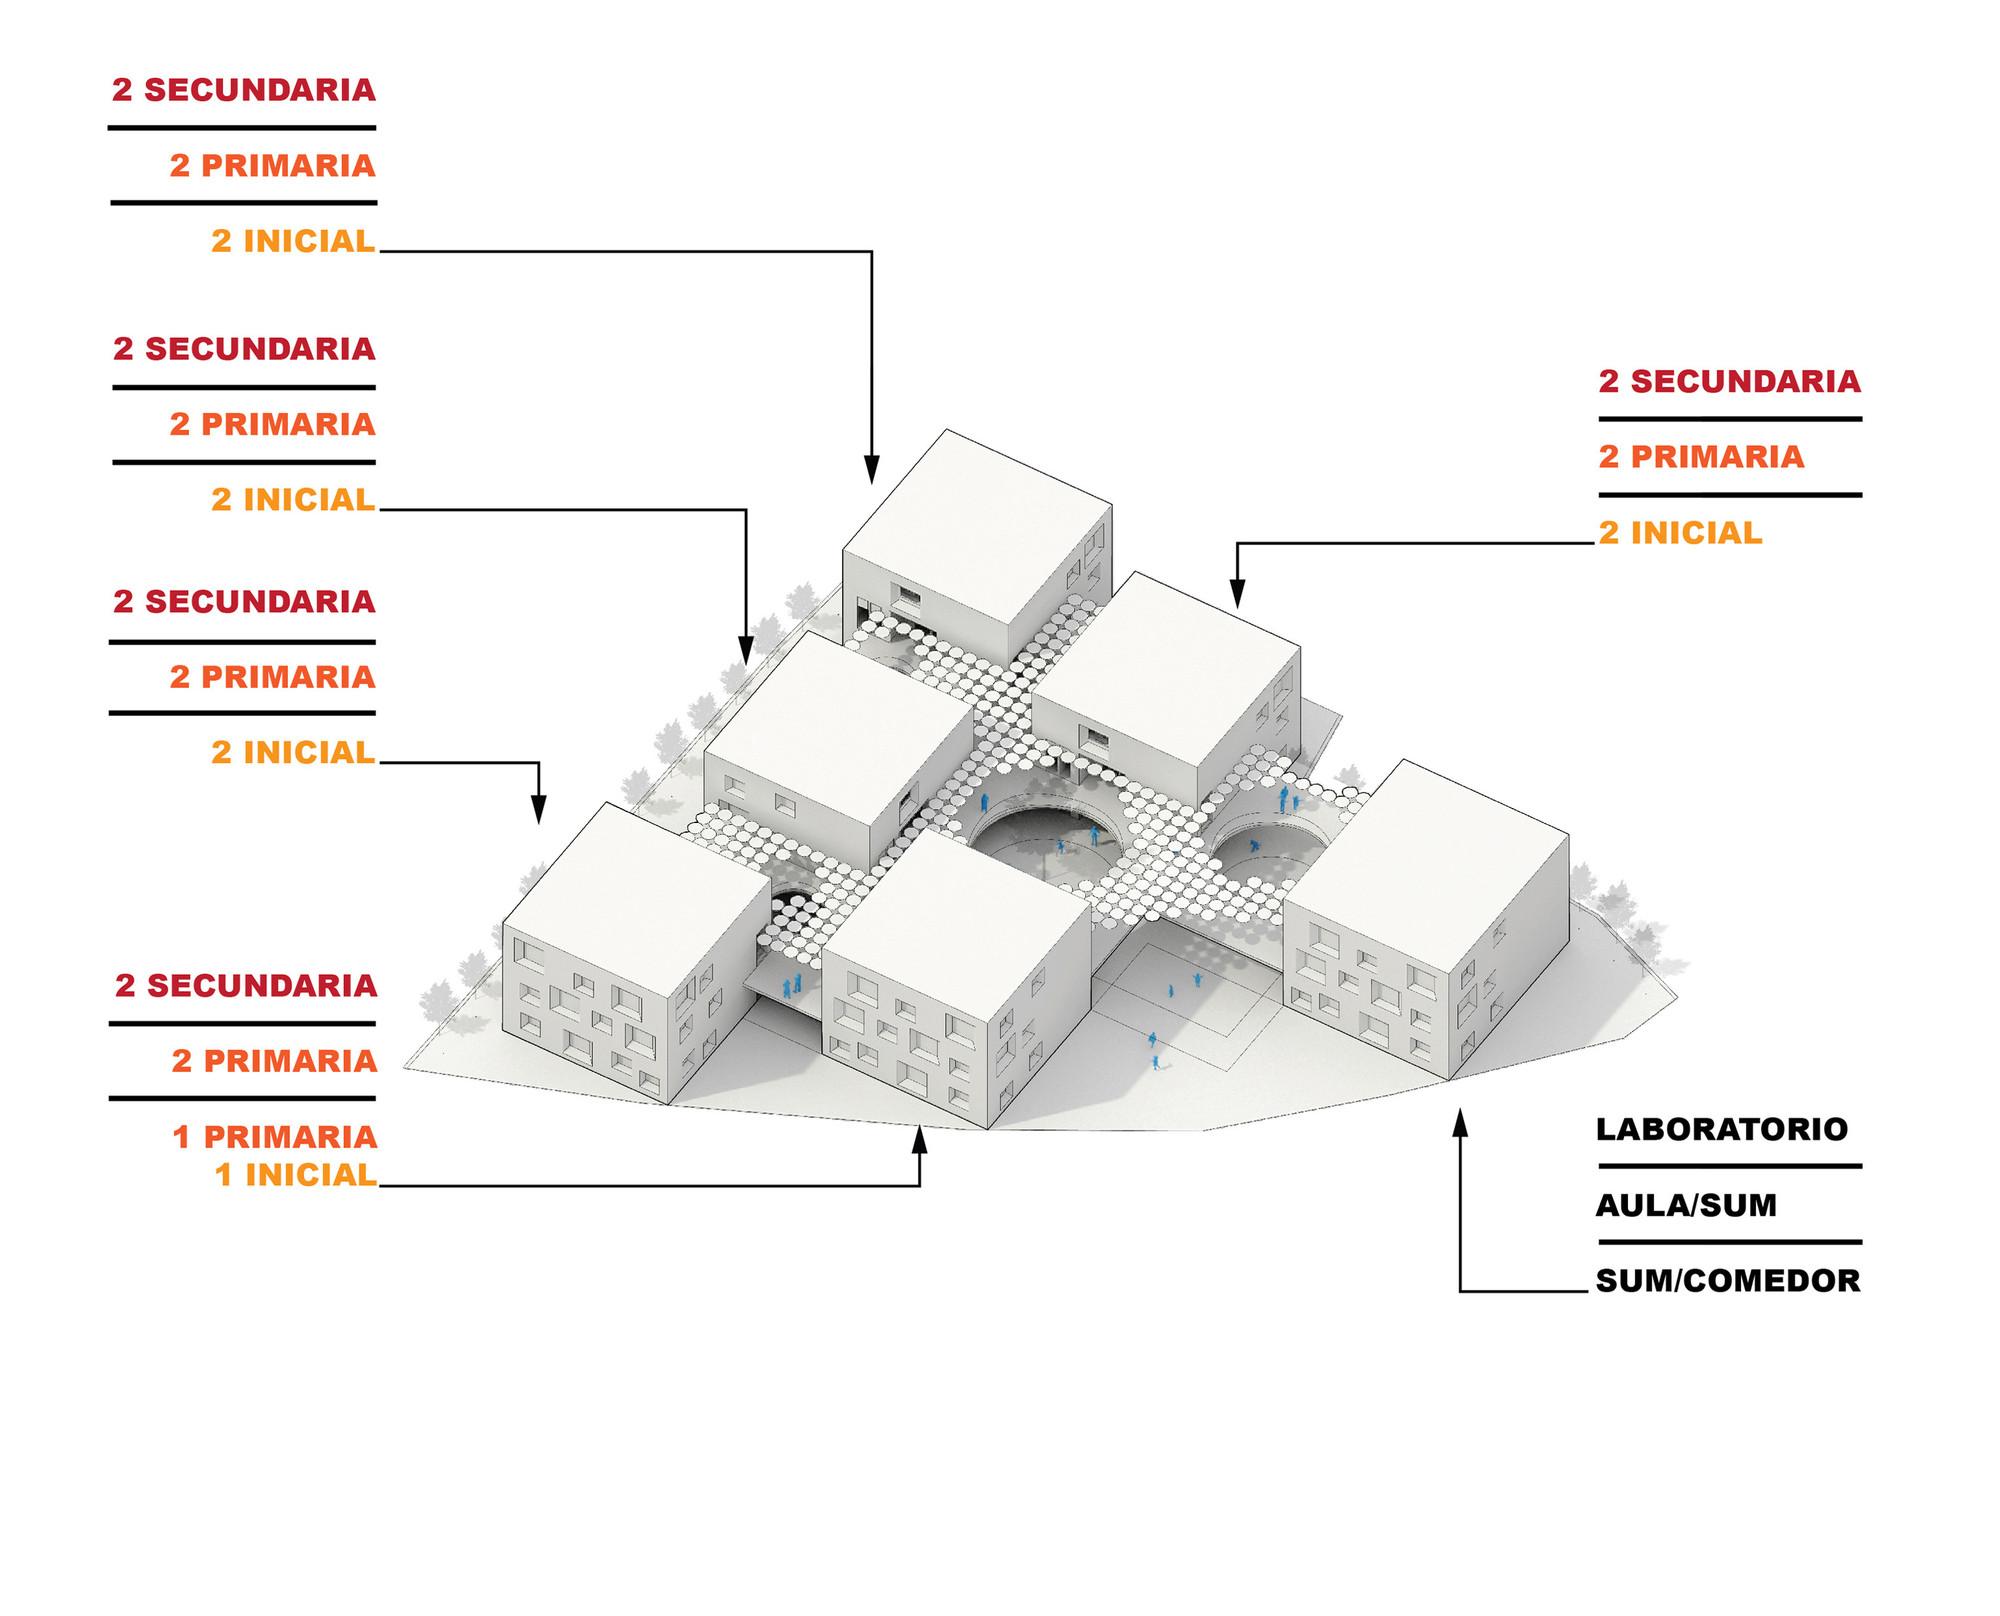 Isométrica general. Image Courtesy of MASUNOSTUDIO